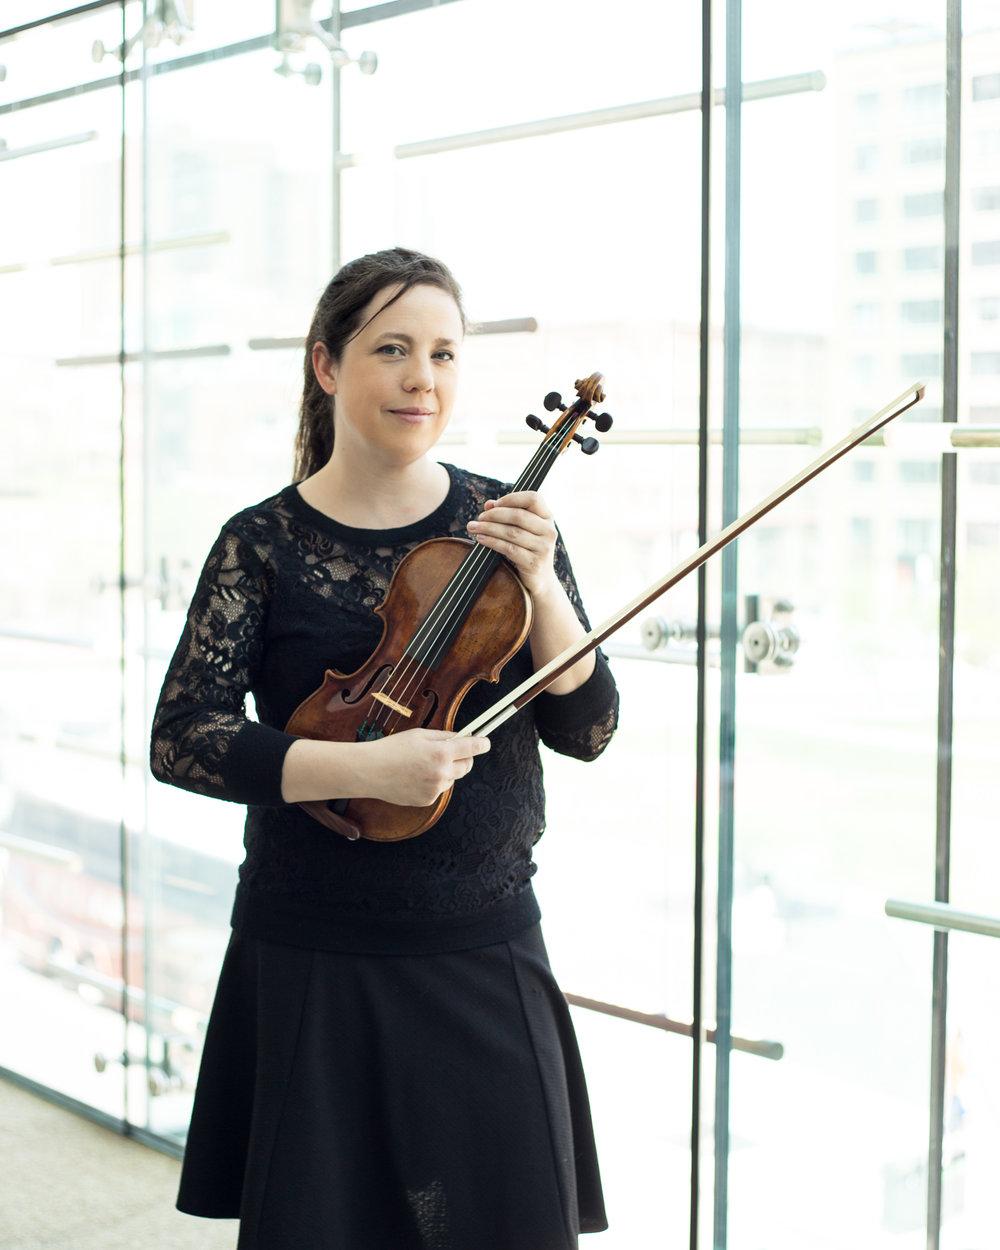 Marianne Dugal